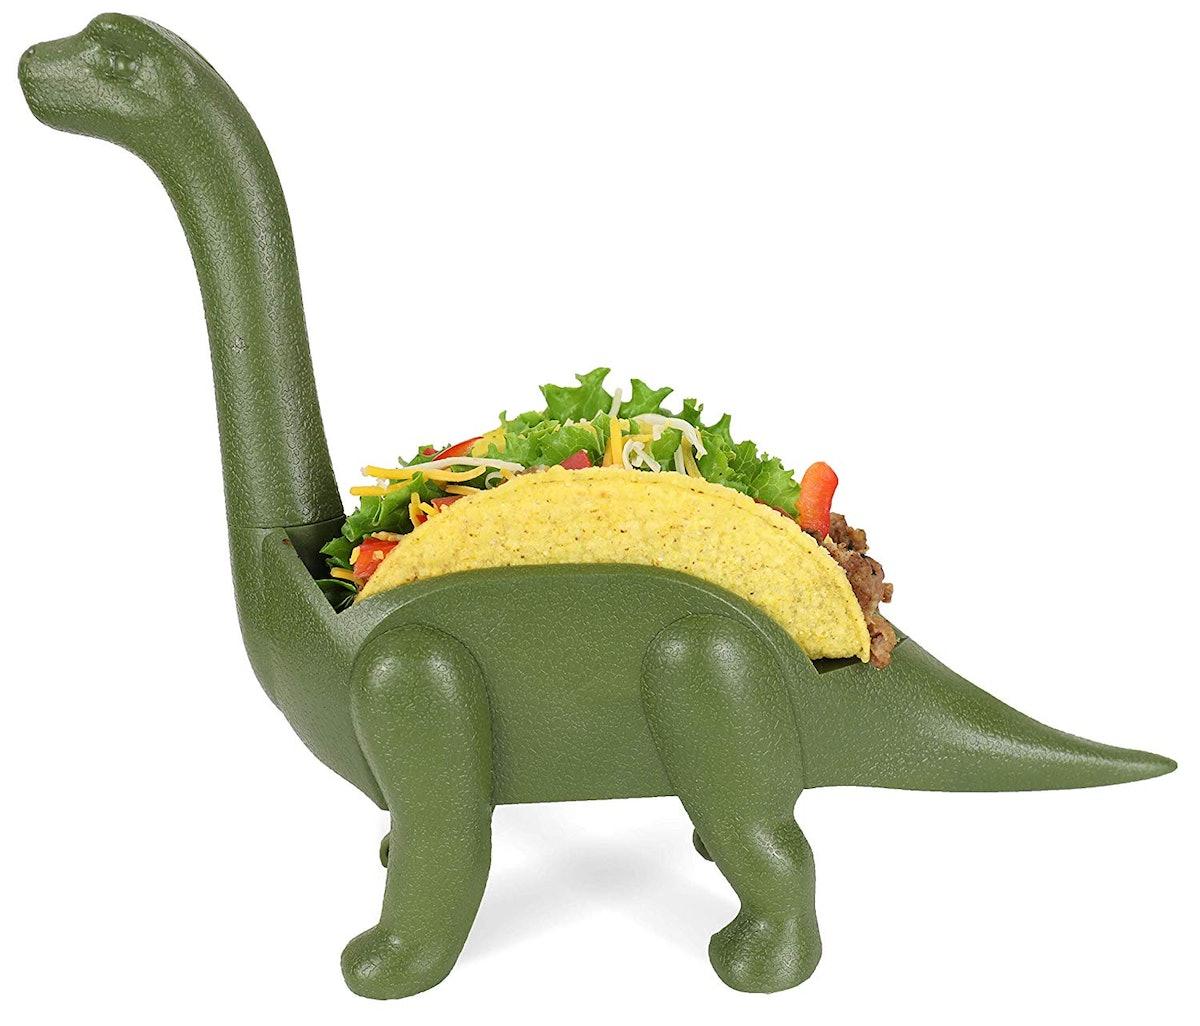 Grub Keepers Dinosaur Taco Holder, $13,